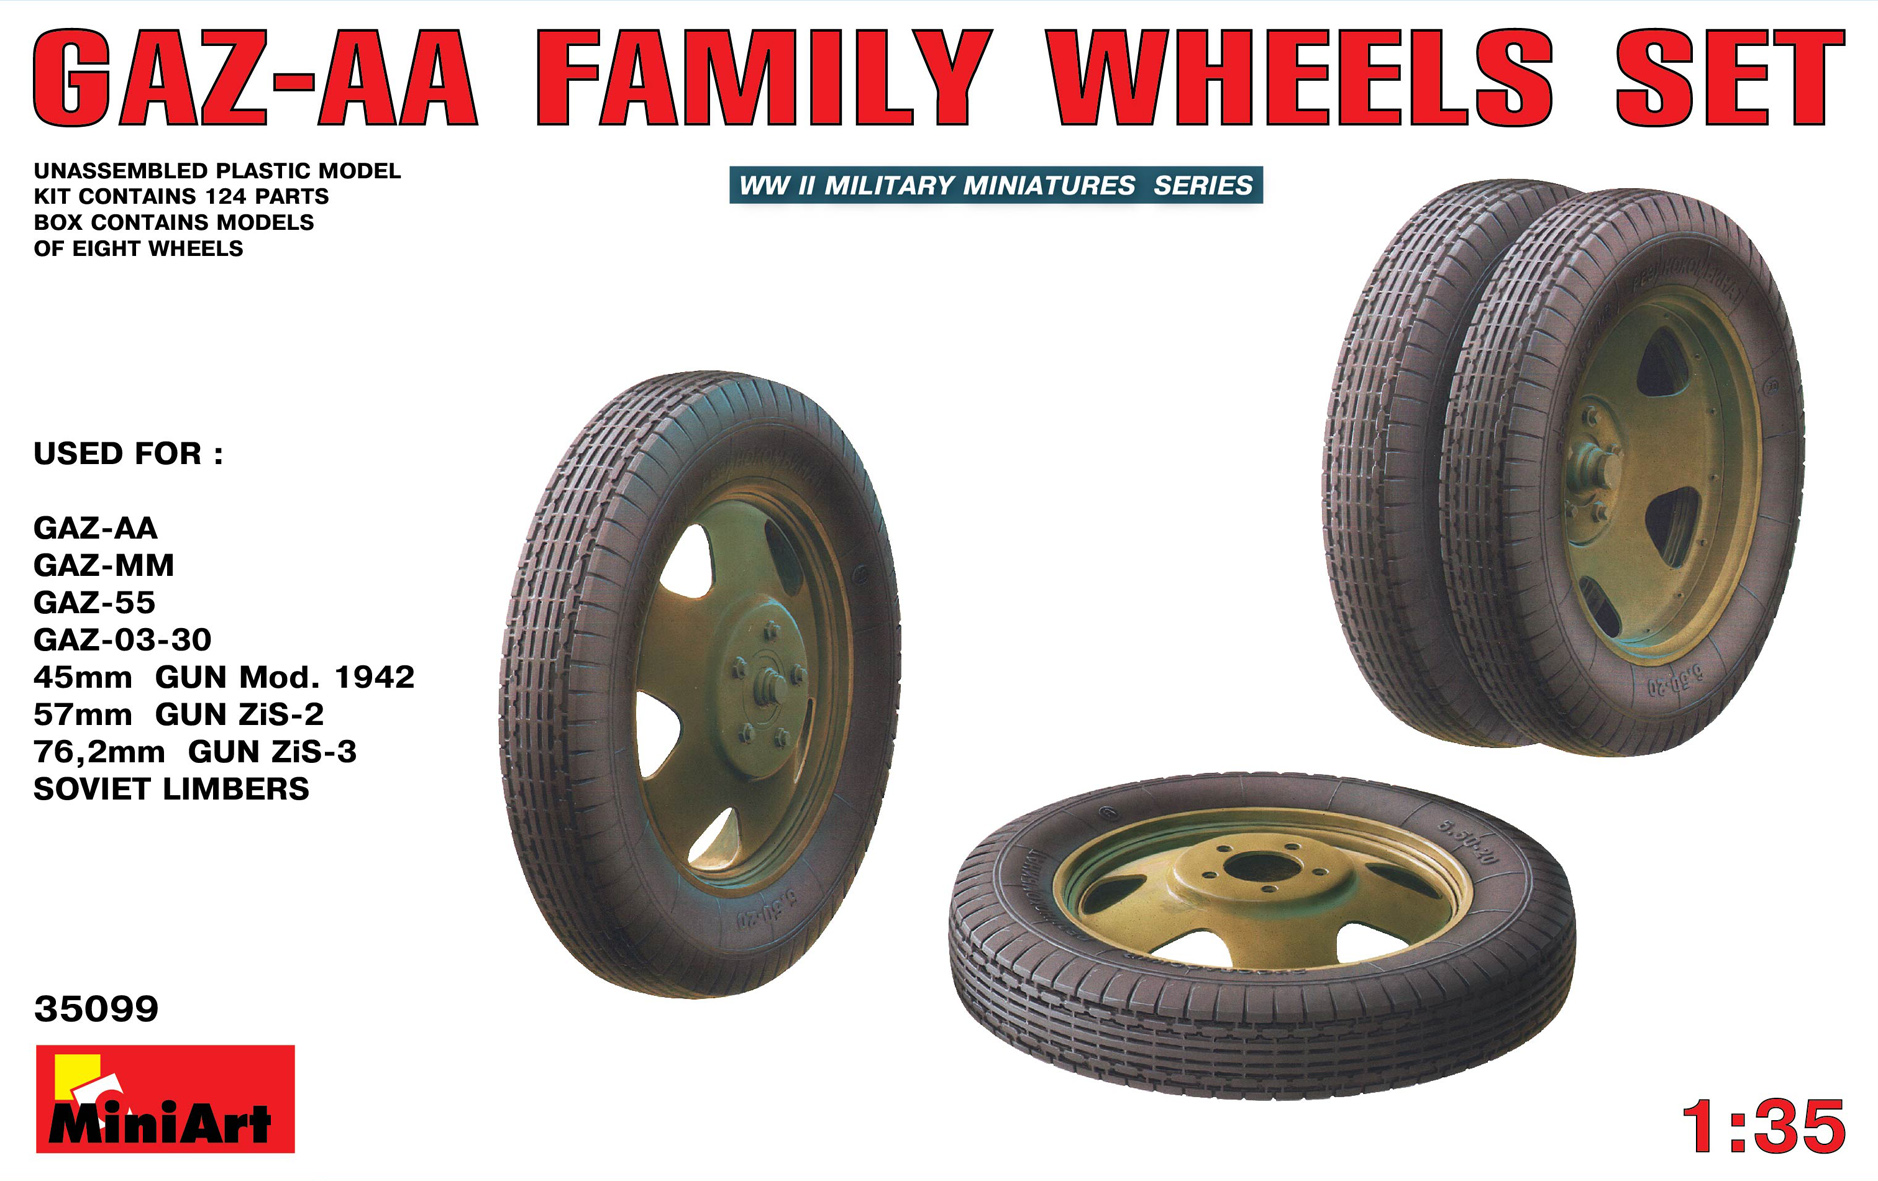 35099 GAZ-AA FAMILY WHEELS SET